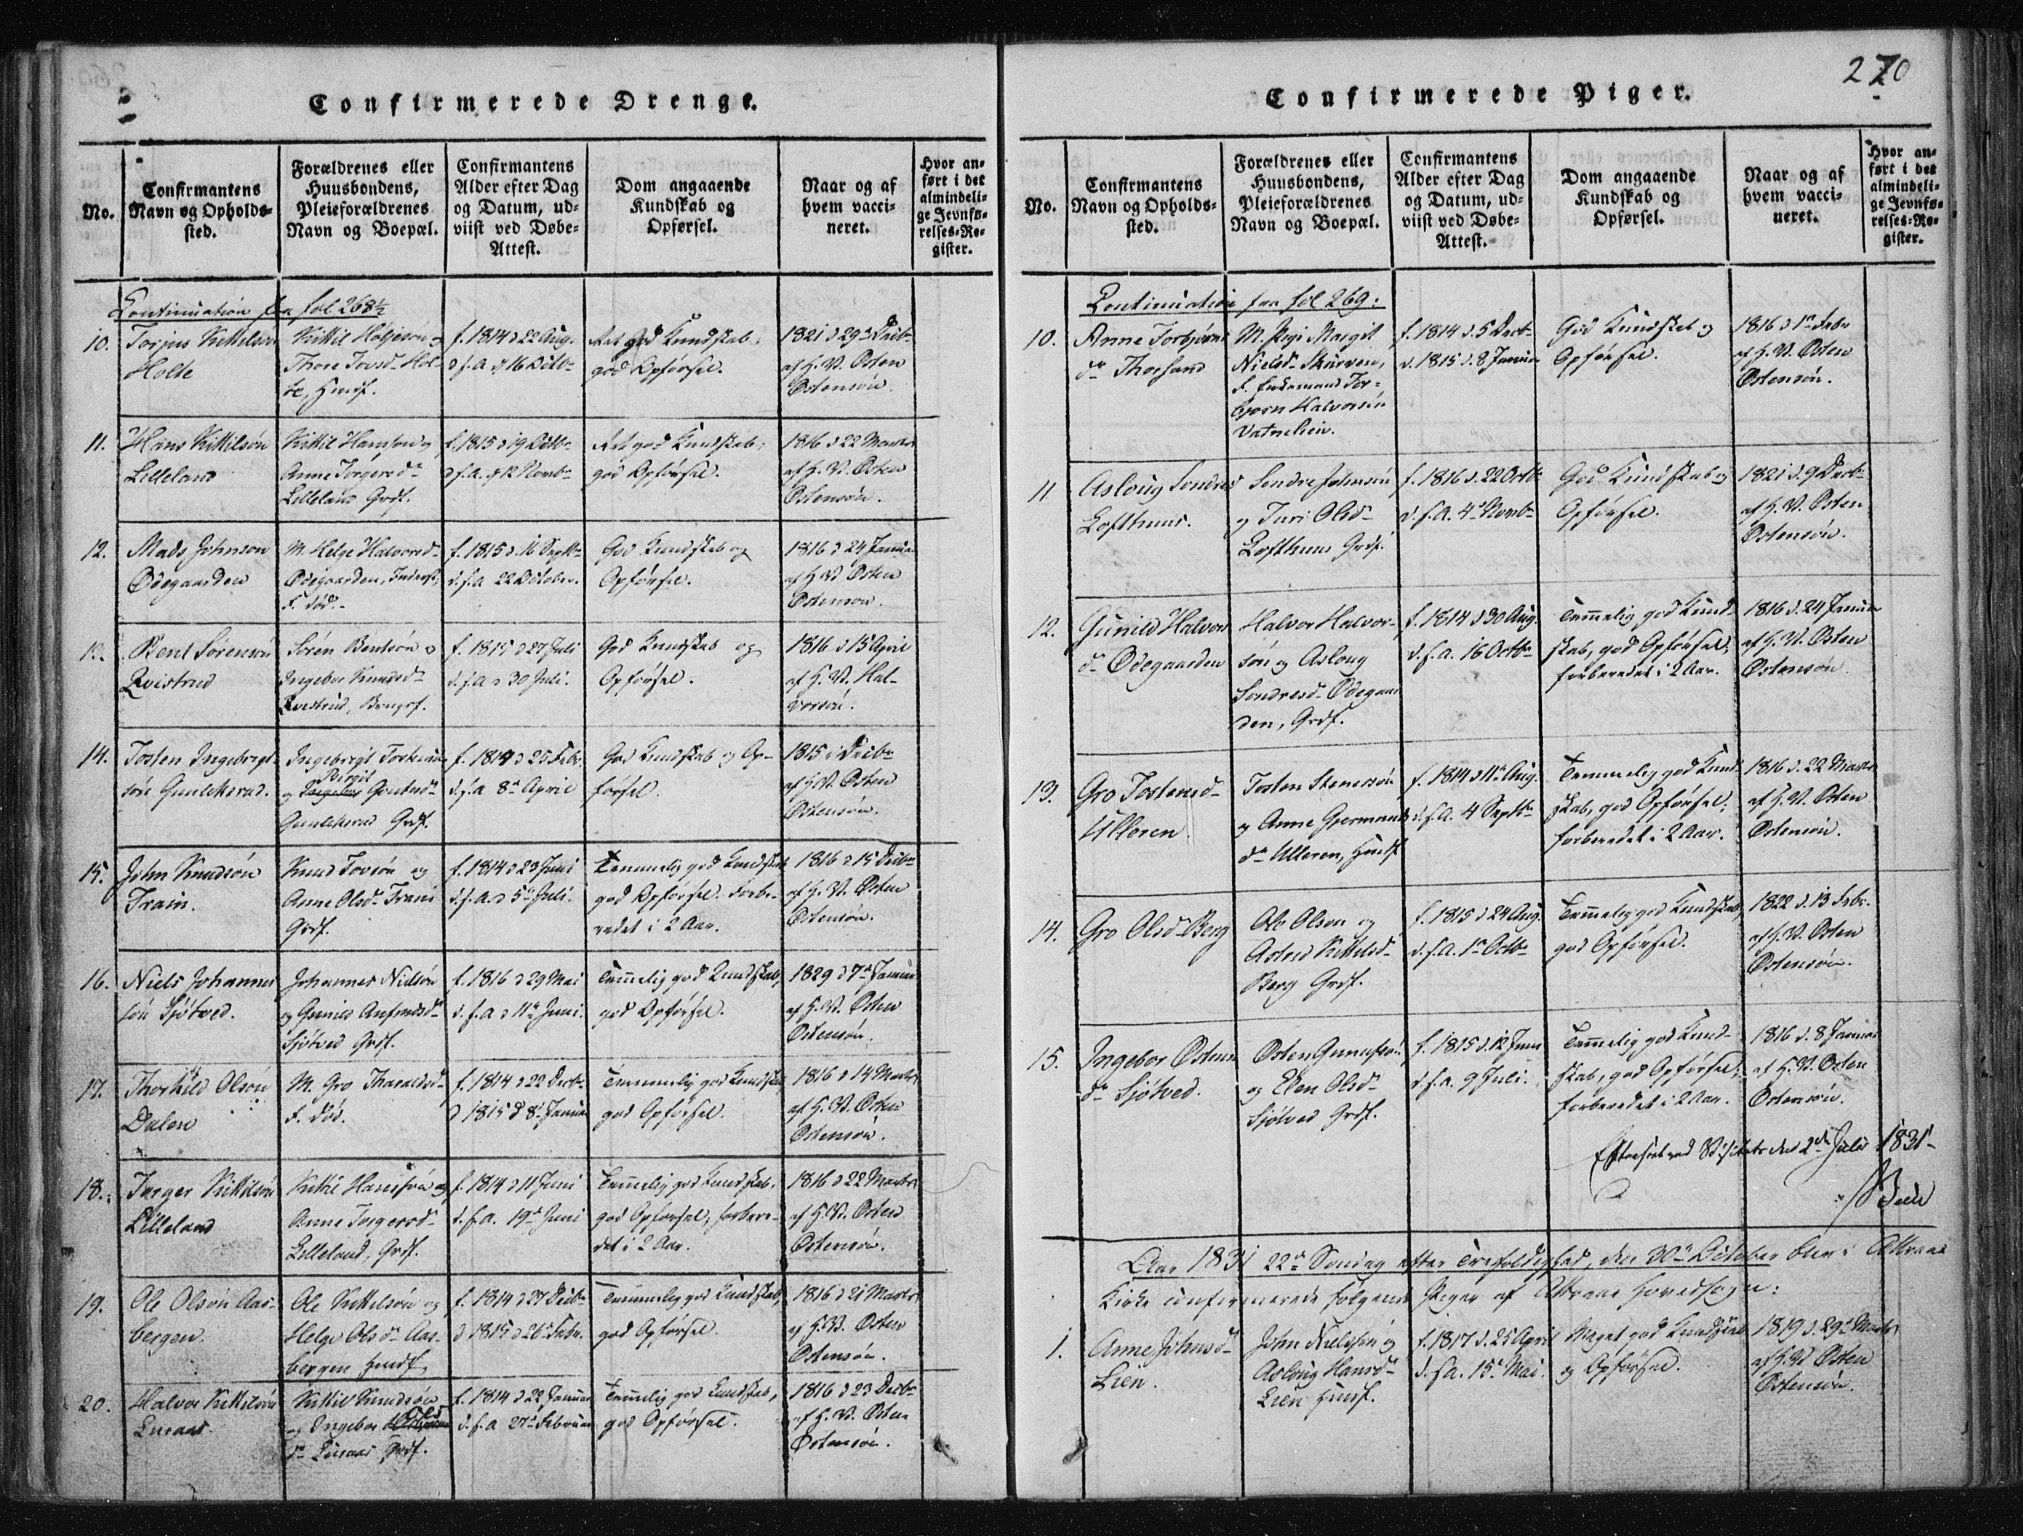 SAKO, Tinn kirkebøker, F/Fa/L0004: Ministerialbok nr. I 4, 1815-1843, s. 270